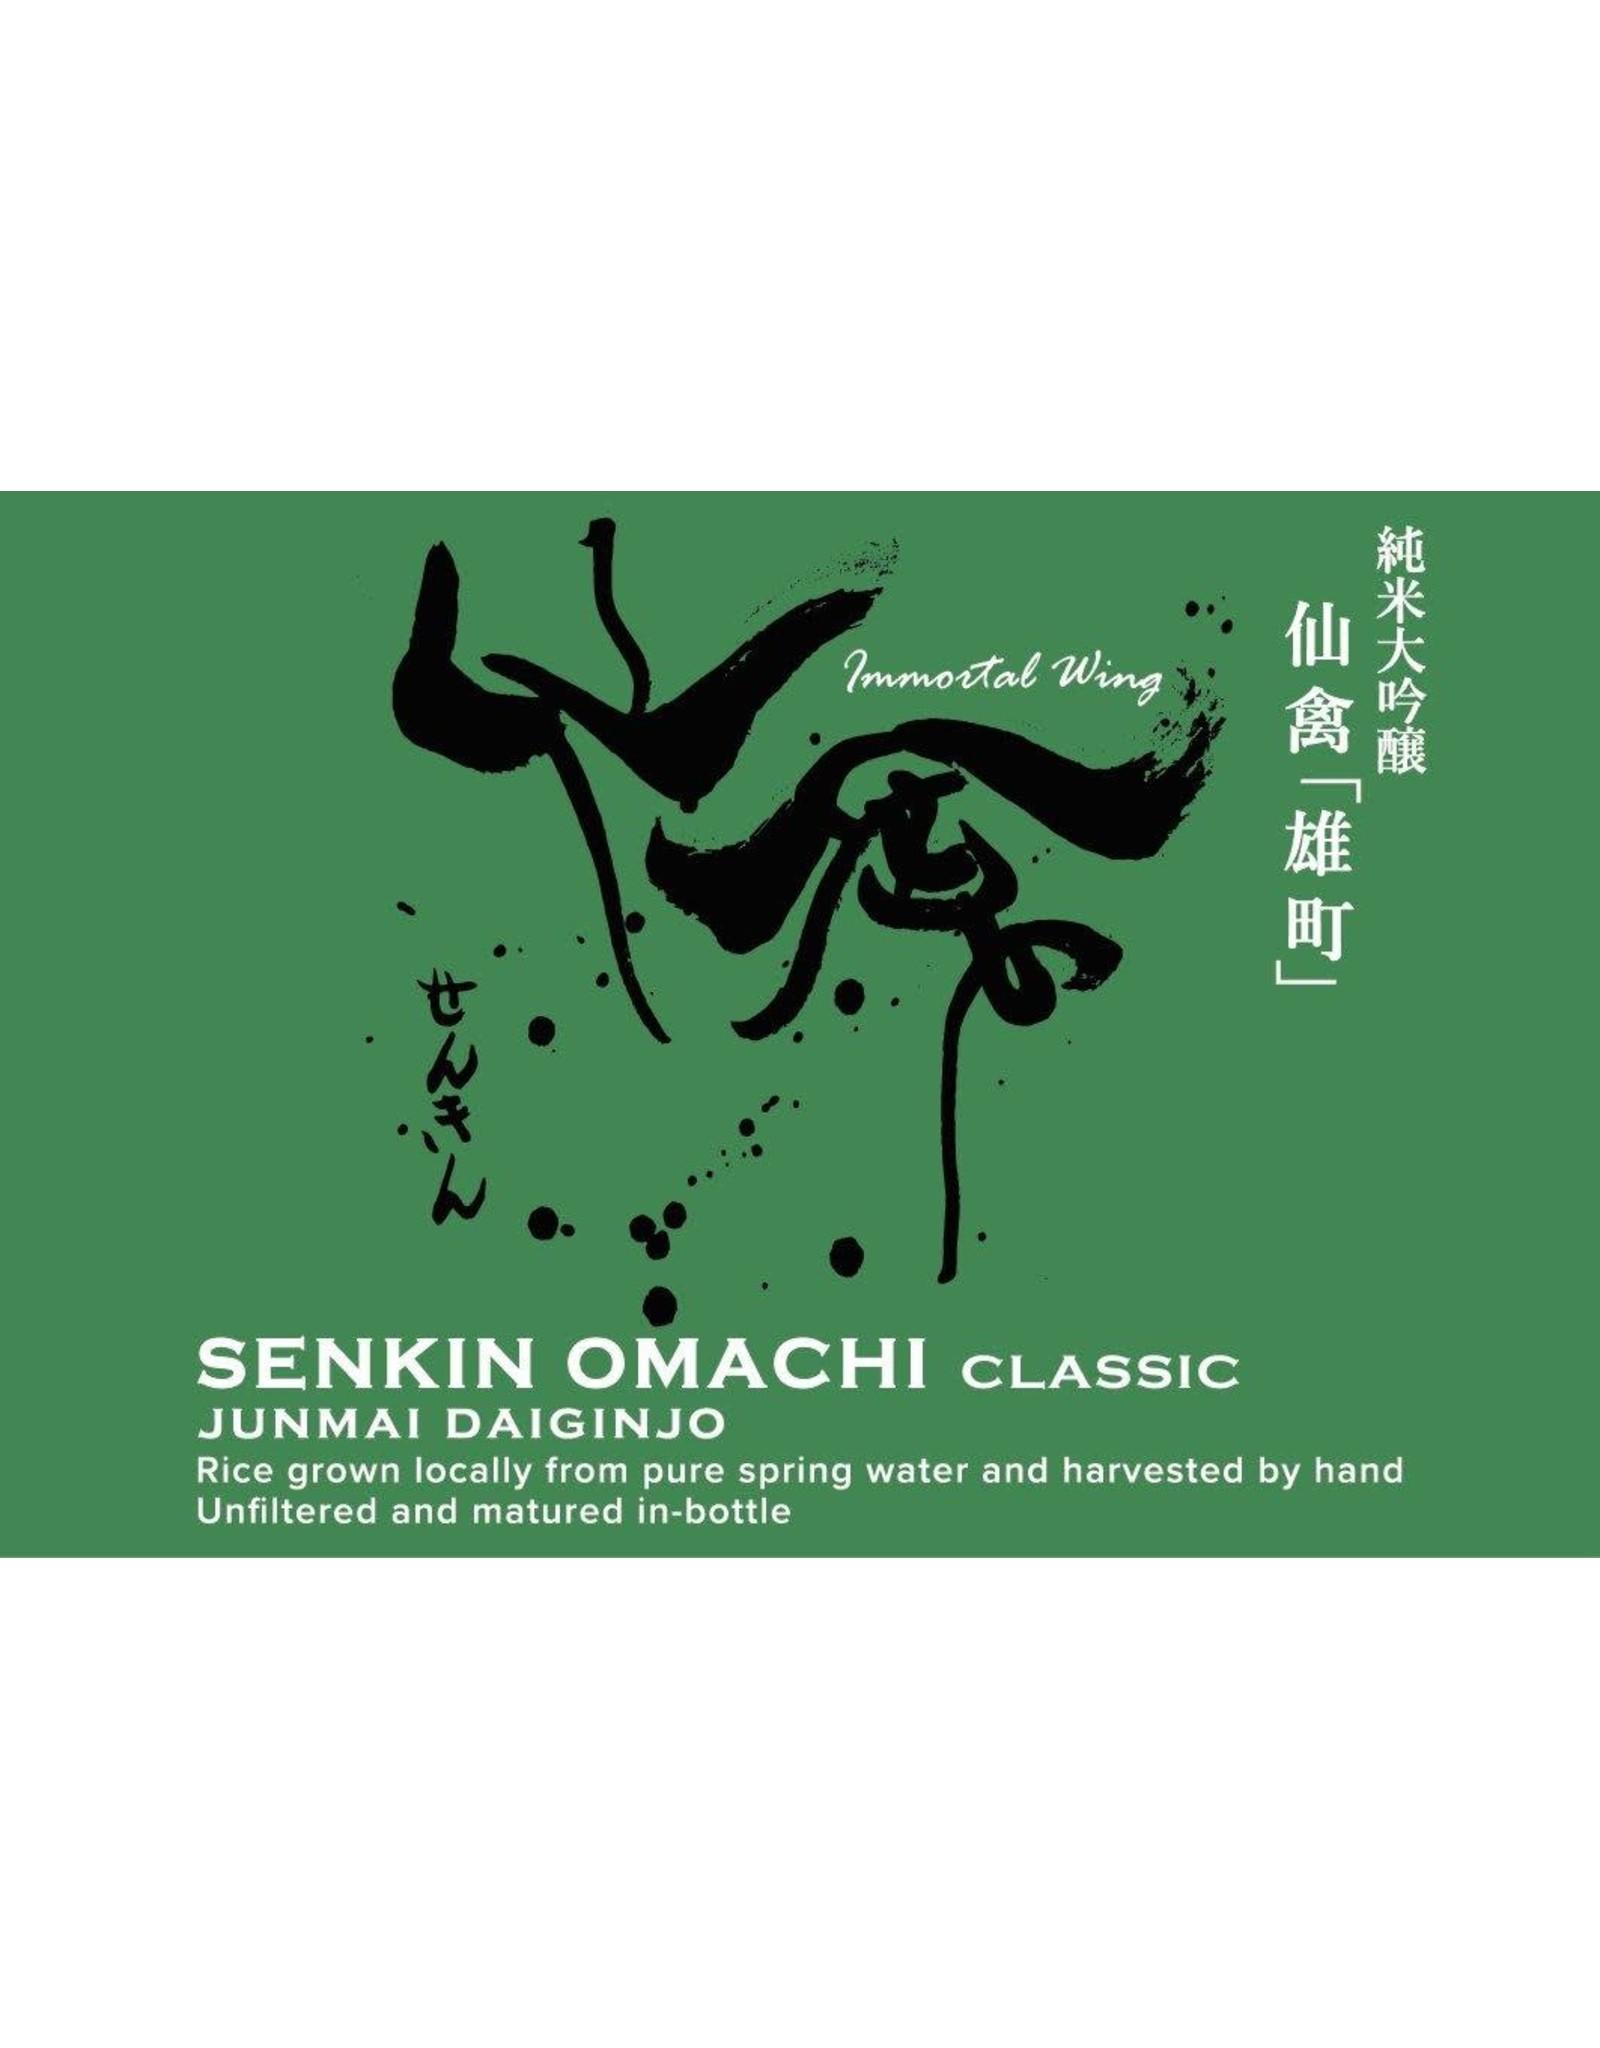 Japan Senkin Classic Omachi Junmai Daiginjo 300ml